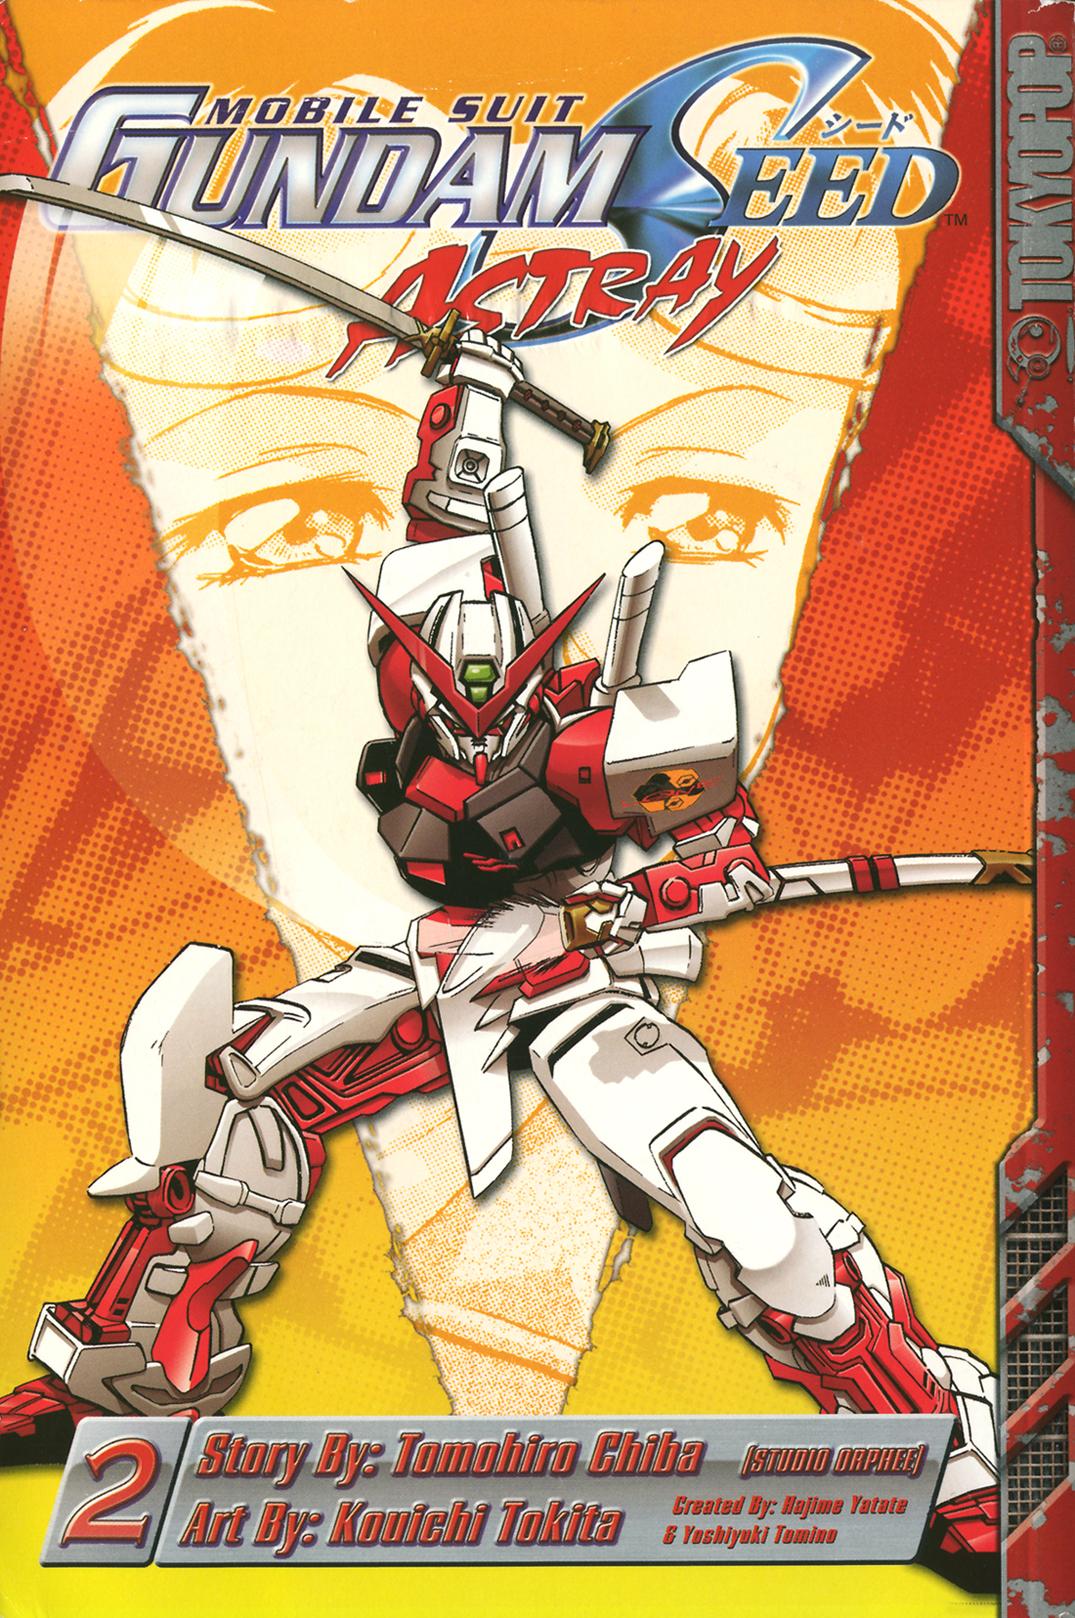 mobile suit gundam seed astray manga download